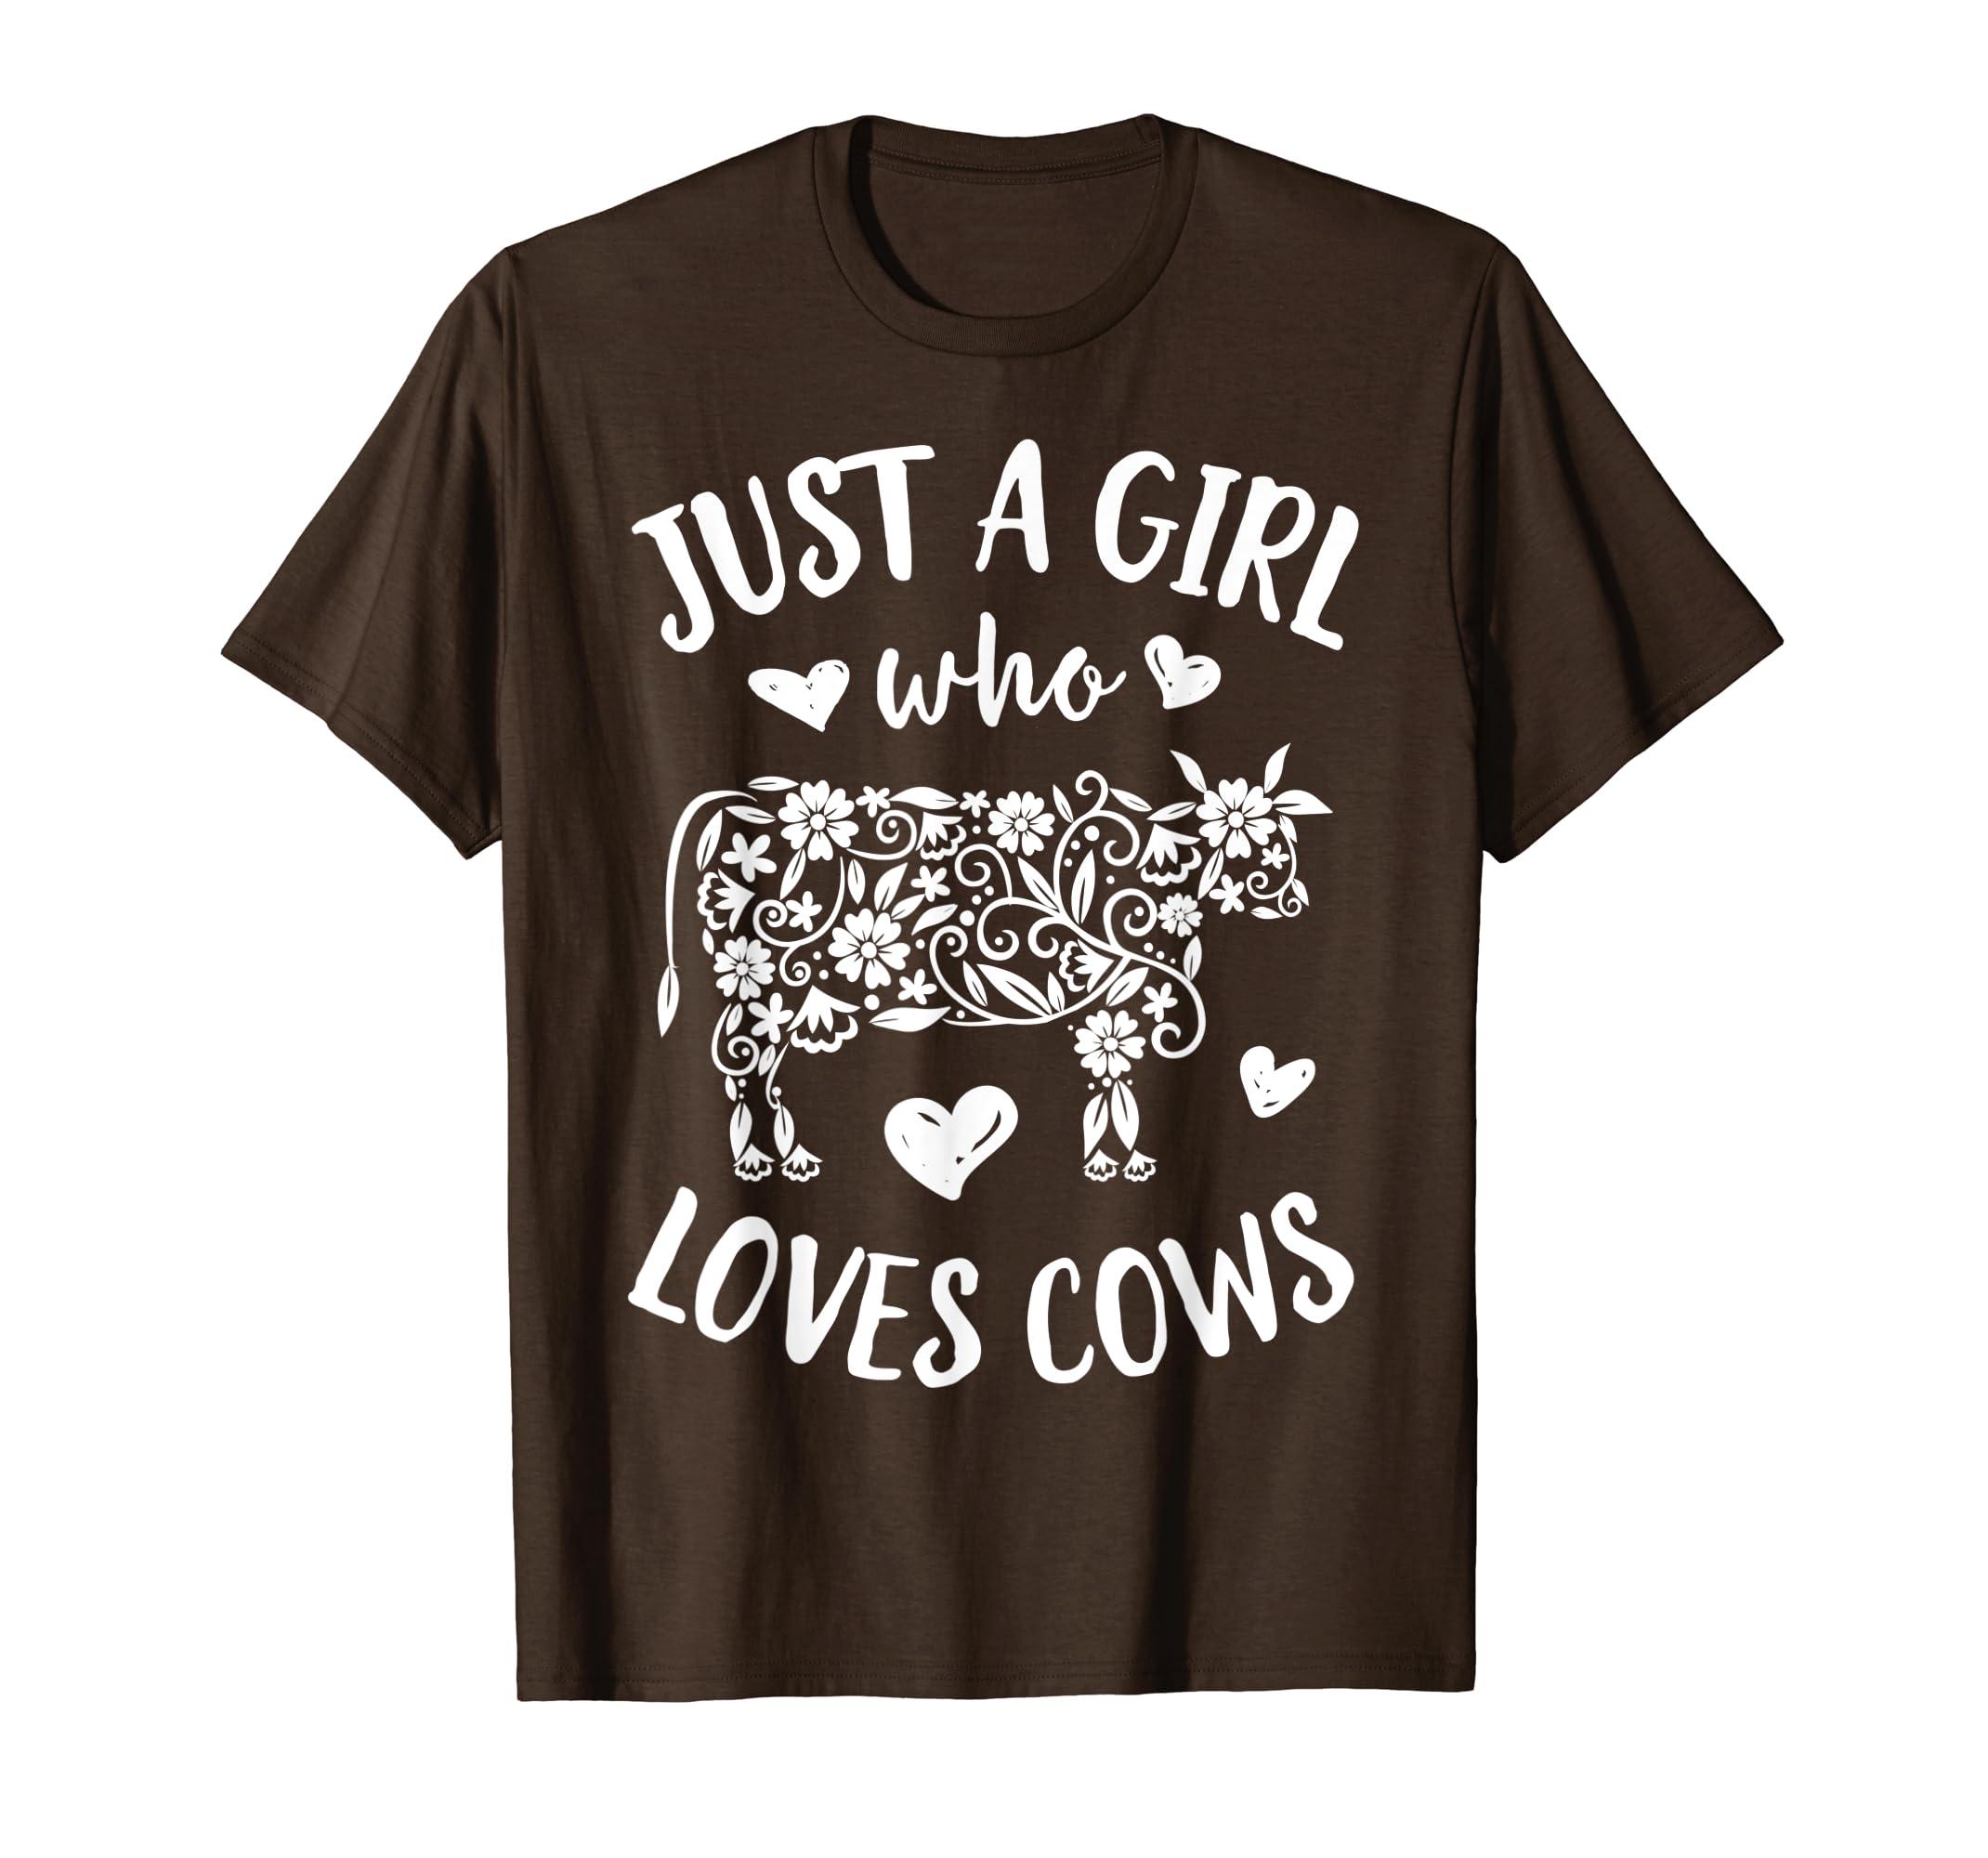 f3a760c03a Just A Girl Who loves Cows T shirt Cow Lover Farm Women Gift